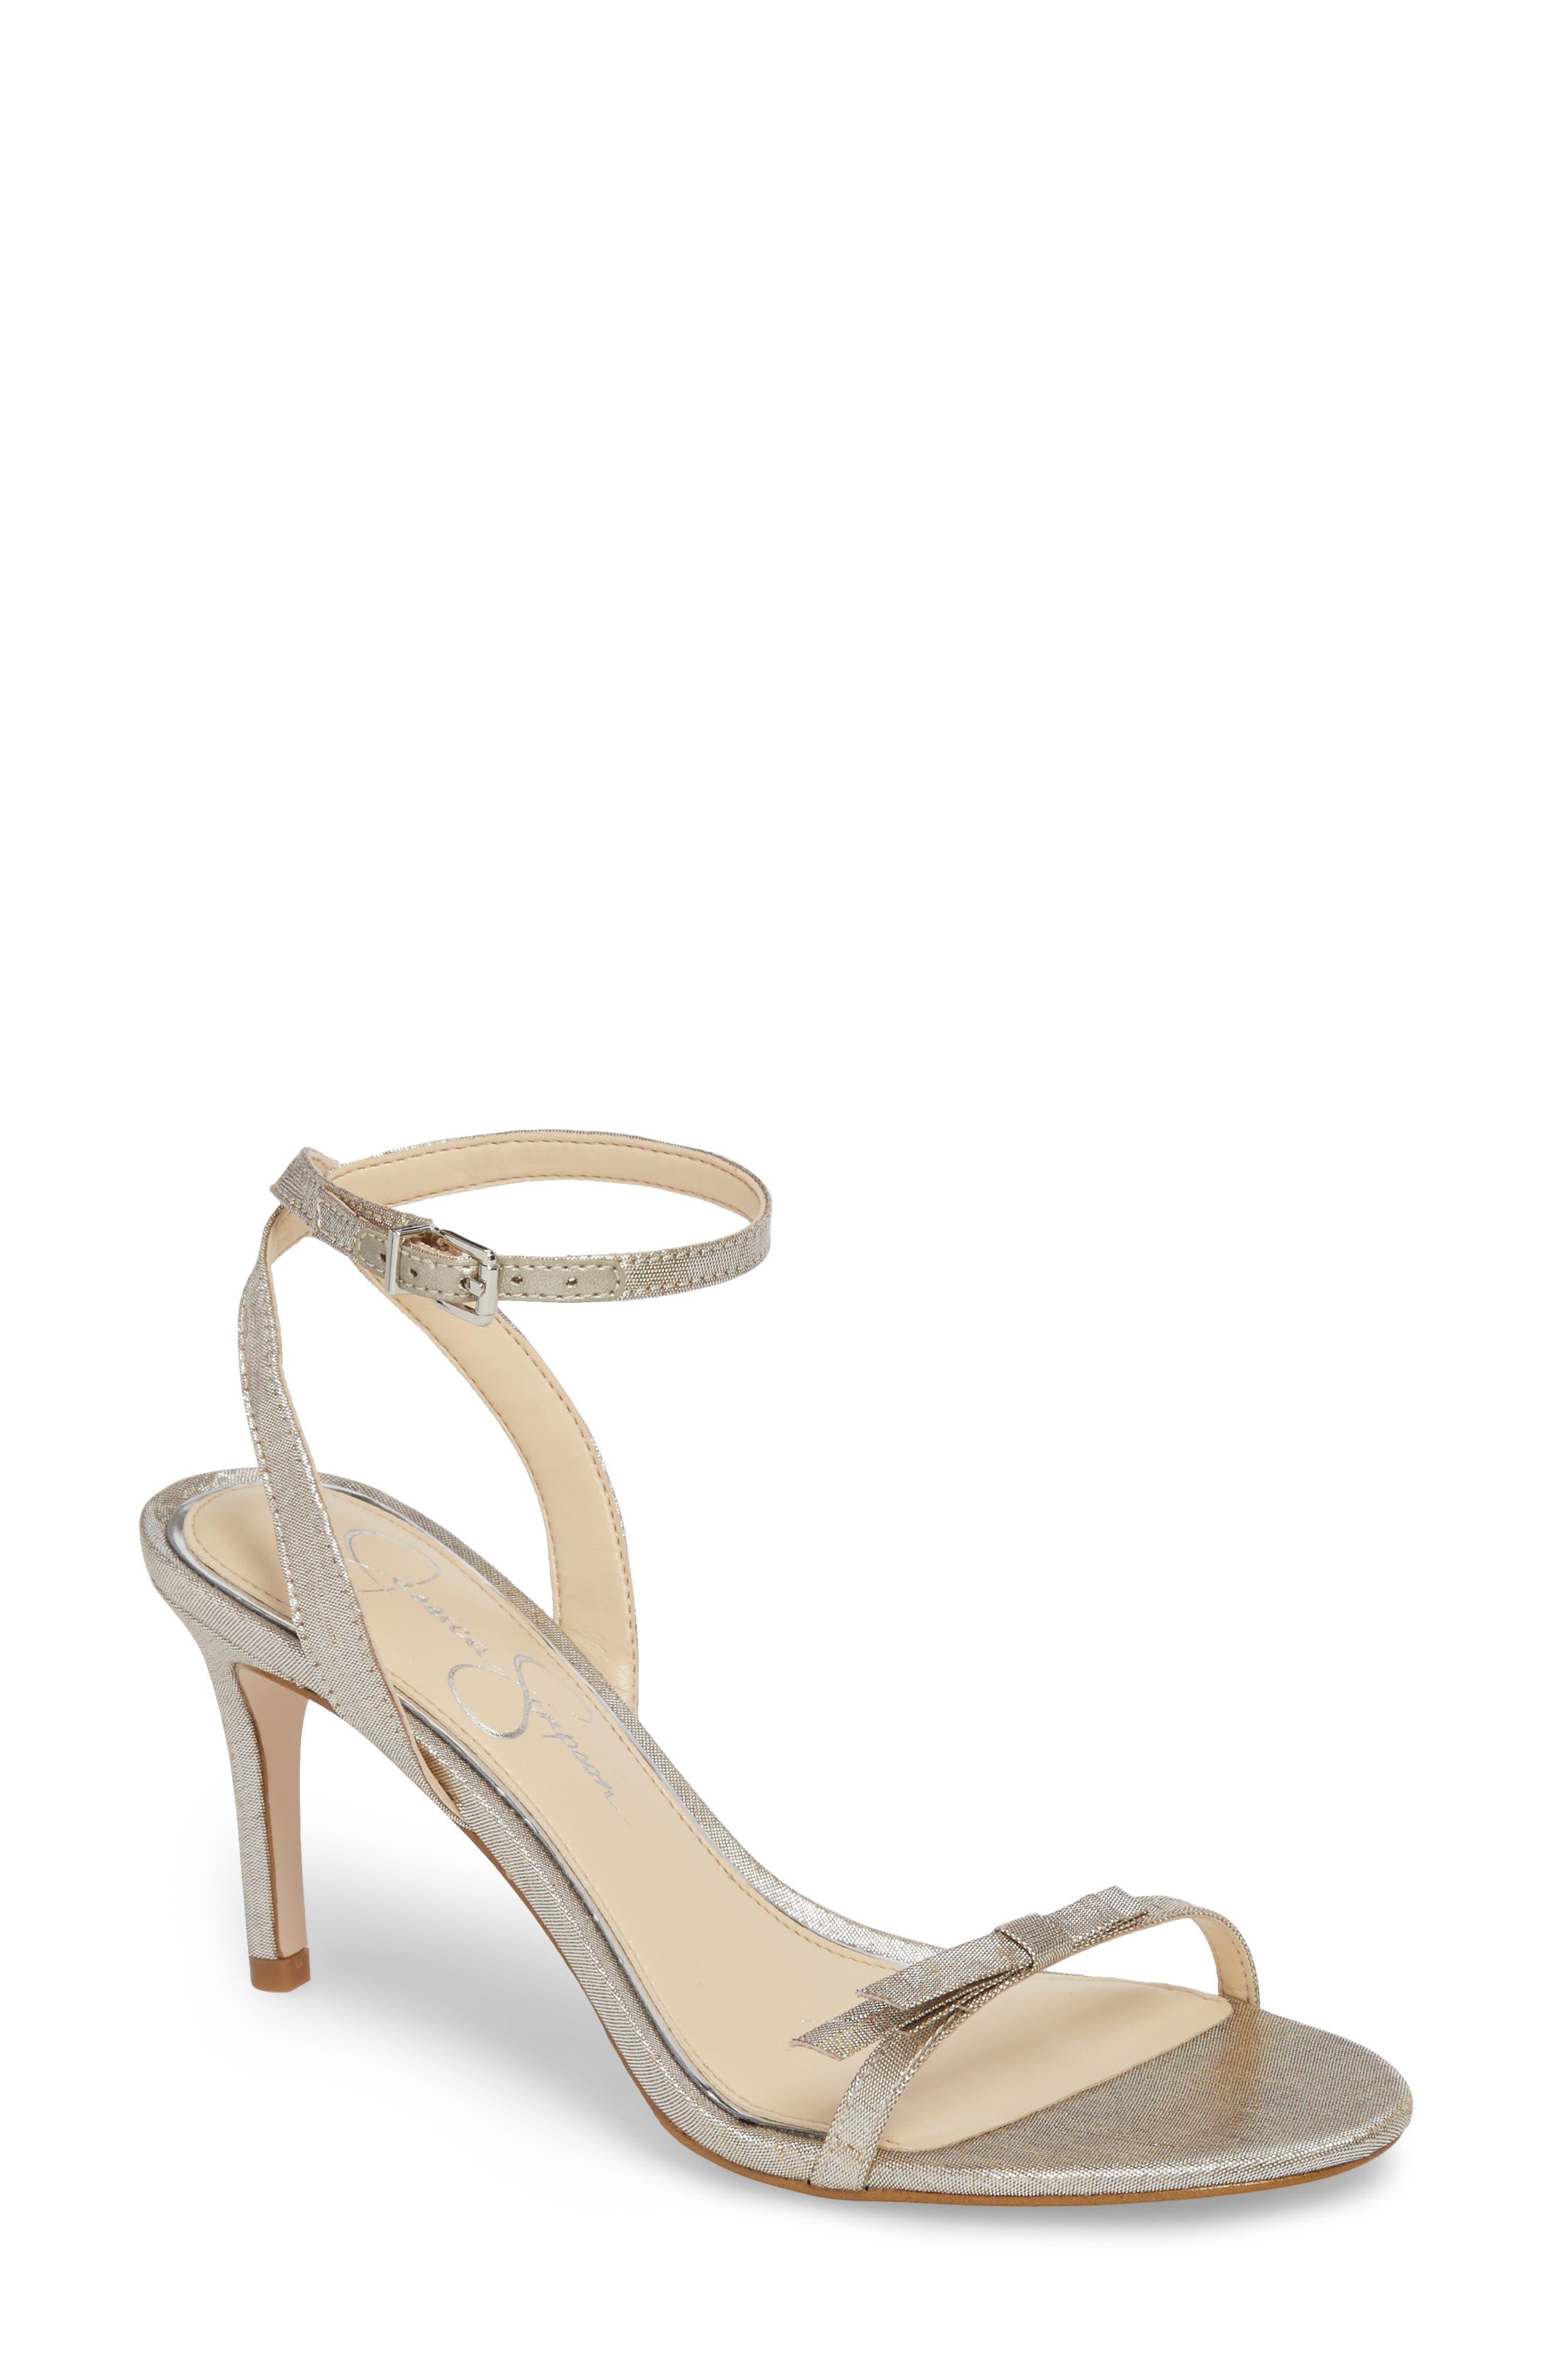 Purella Sandal,                         Main,                         color, Shimmer Silver